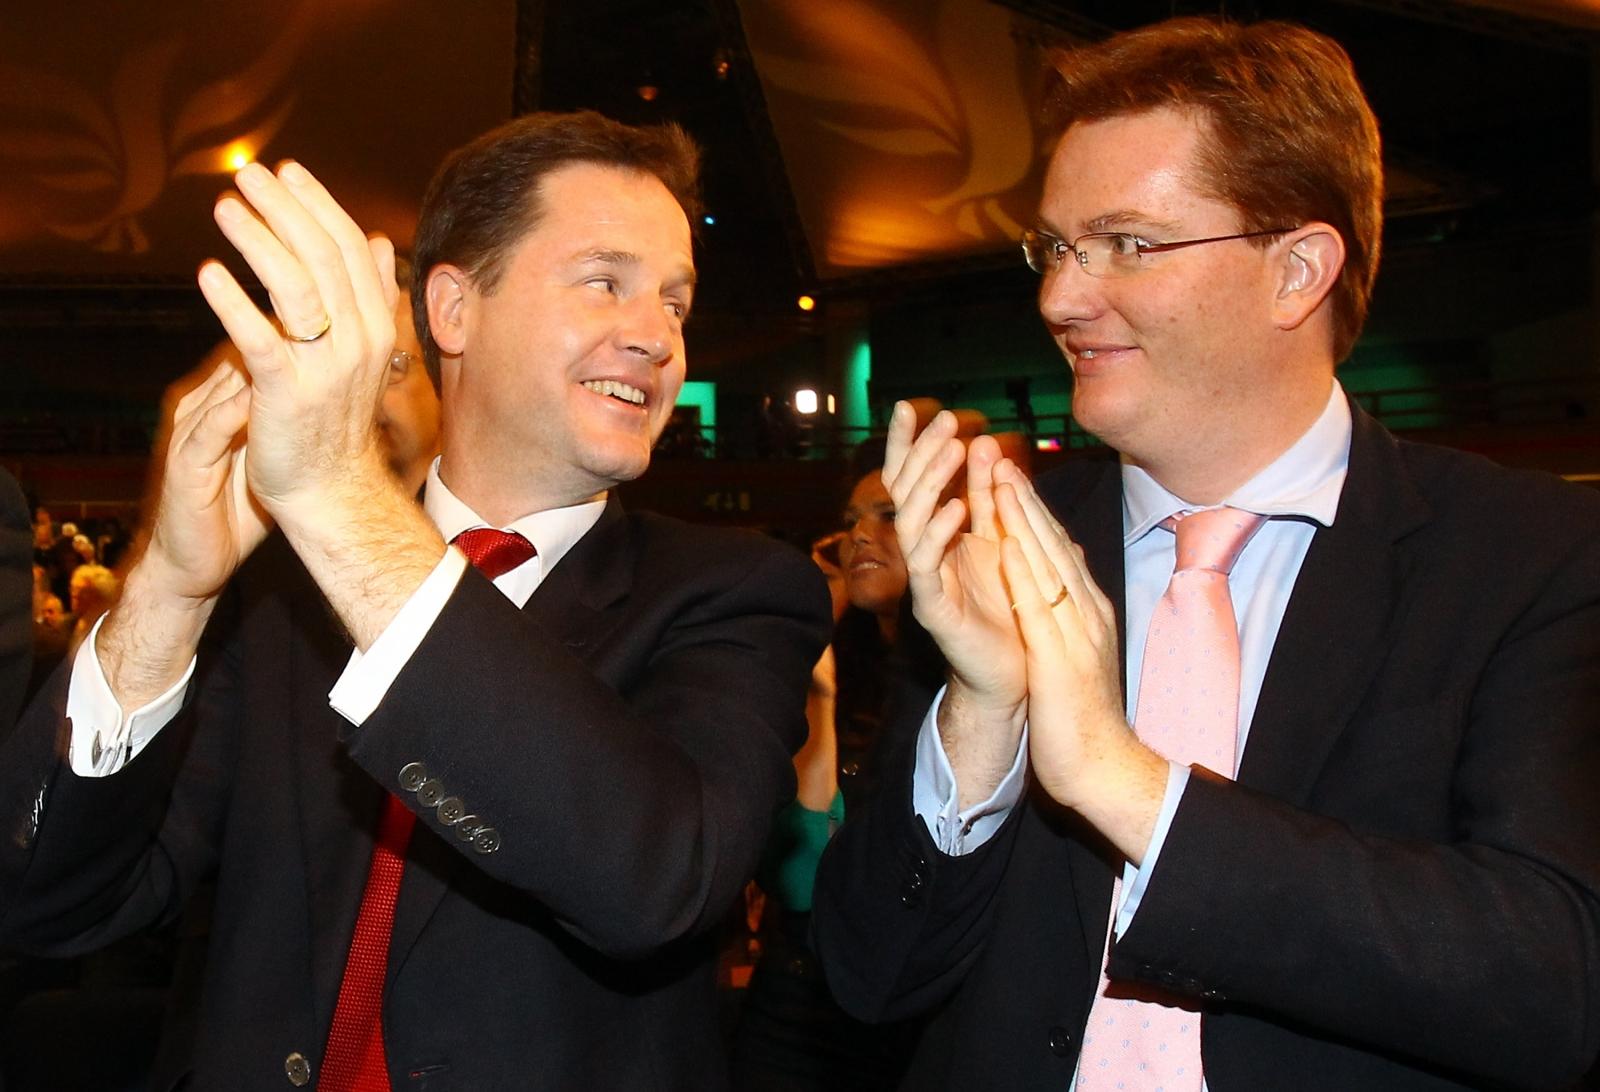 Nick Clegg and Danny Alexander